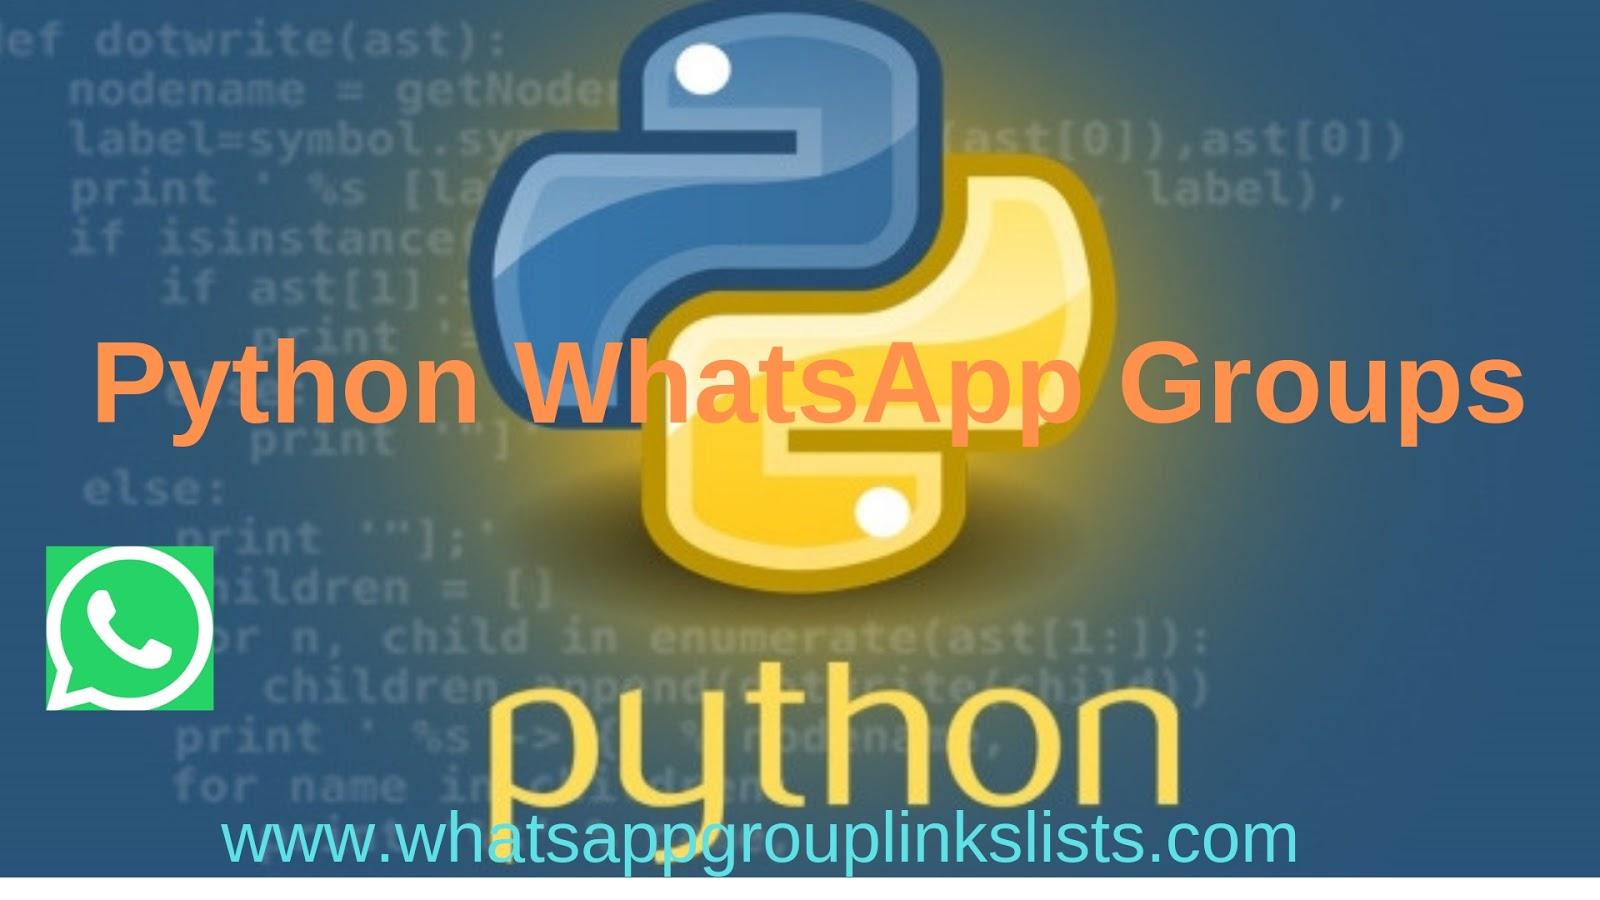 Join Python WhatsApp Group Links List